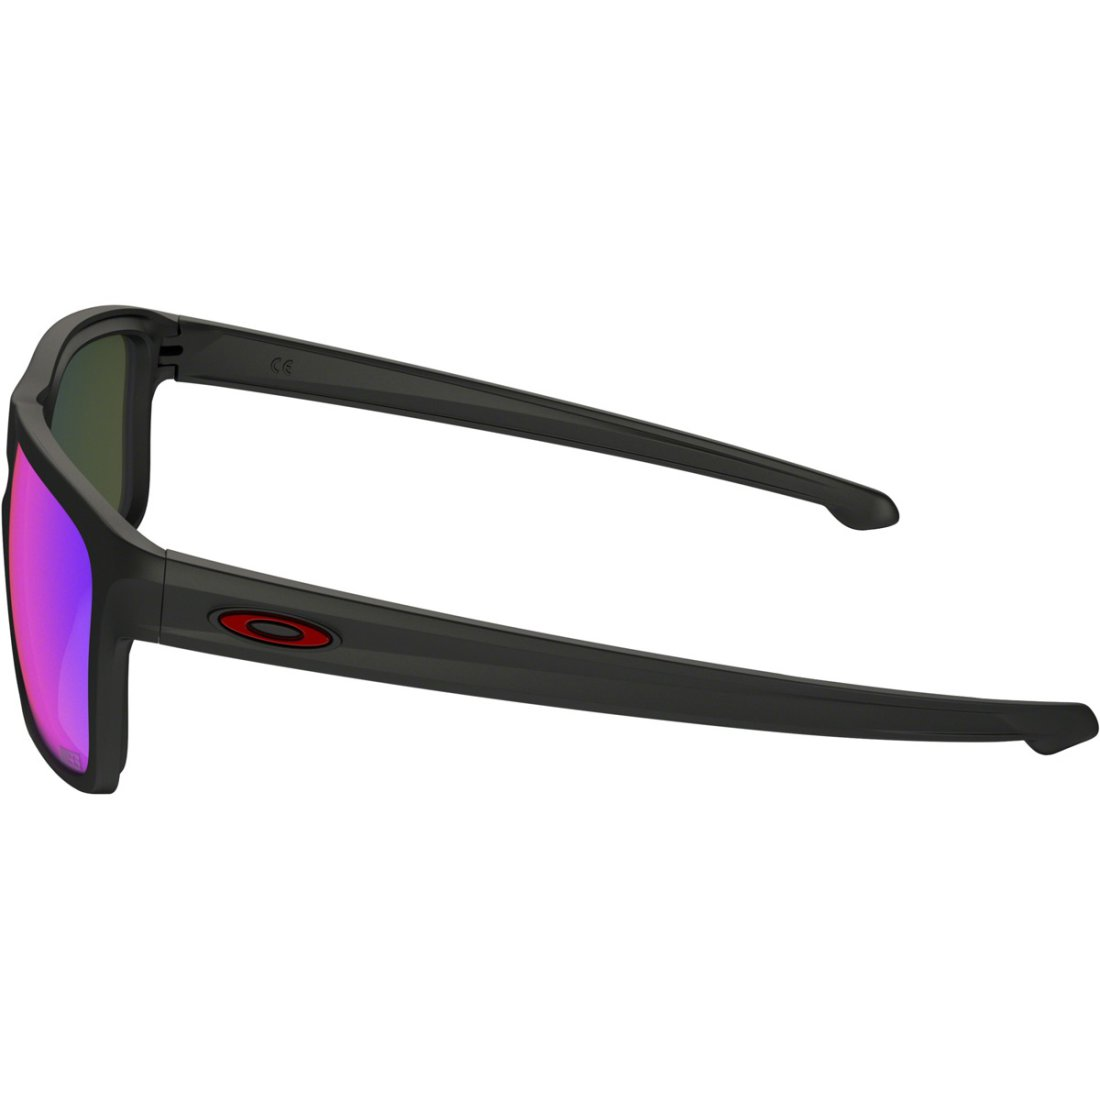 77fc654b495 OAKLEY Sliver Marc Marquez Exclusive Edition Matte Black   Positive Red  Iridium Sun glasses